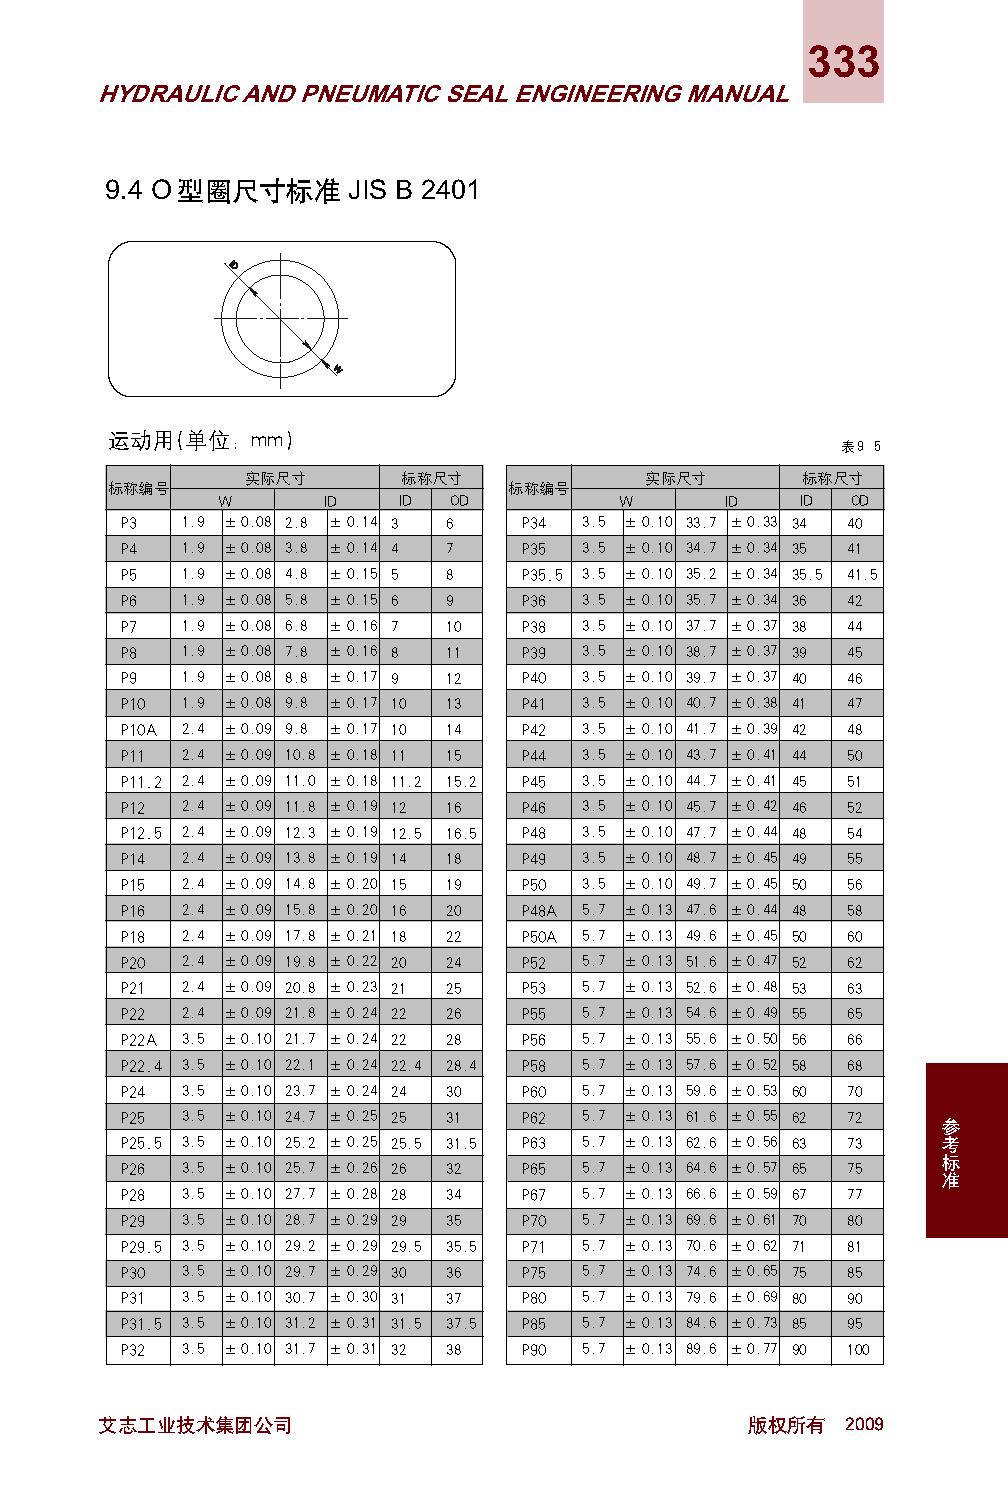 O型圈尺寸标准JIS B 2401